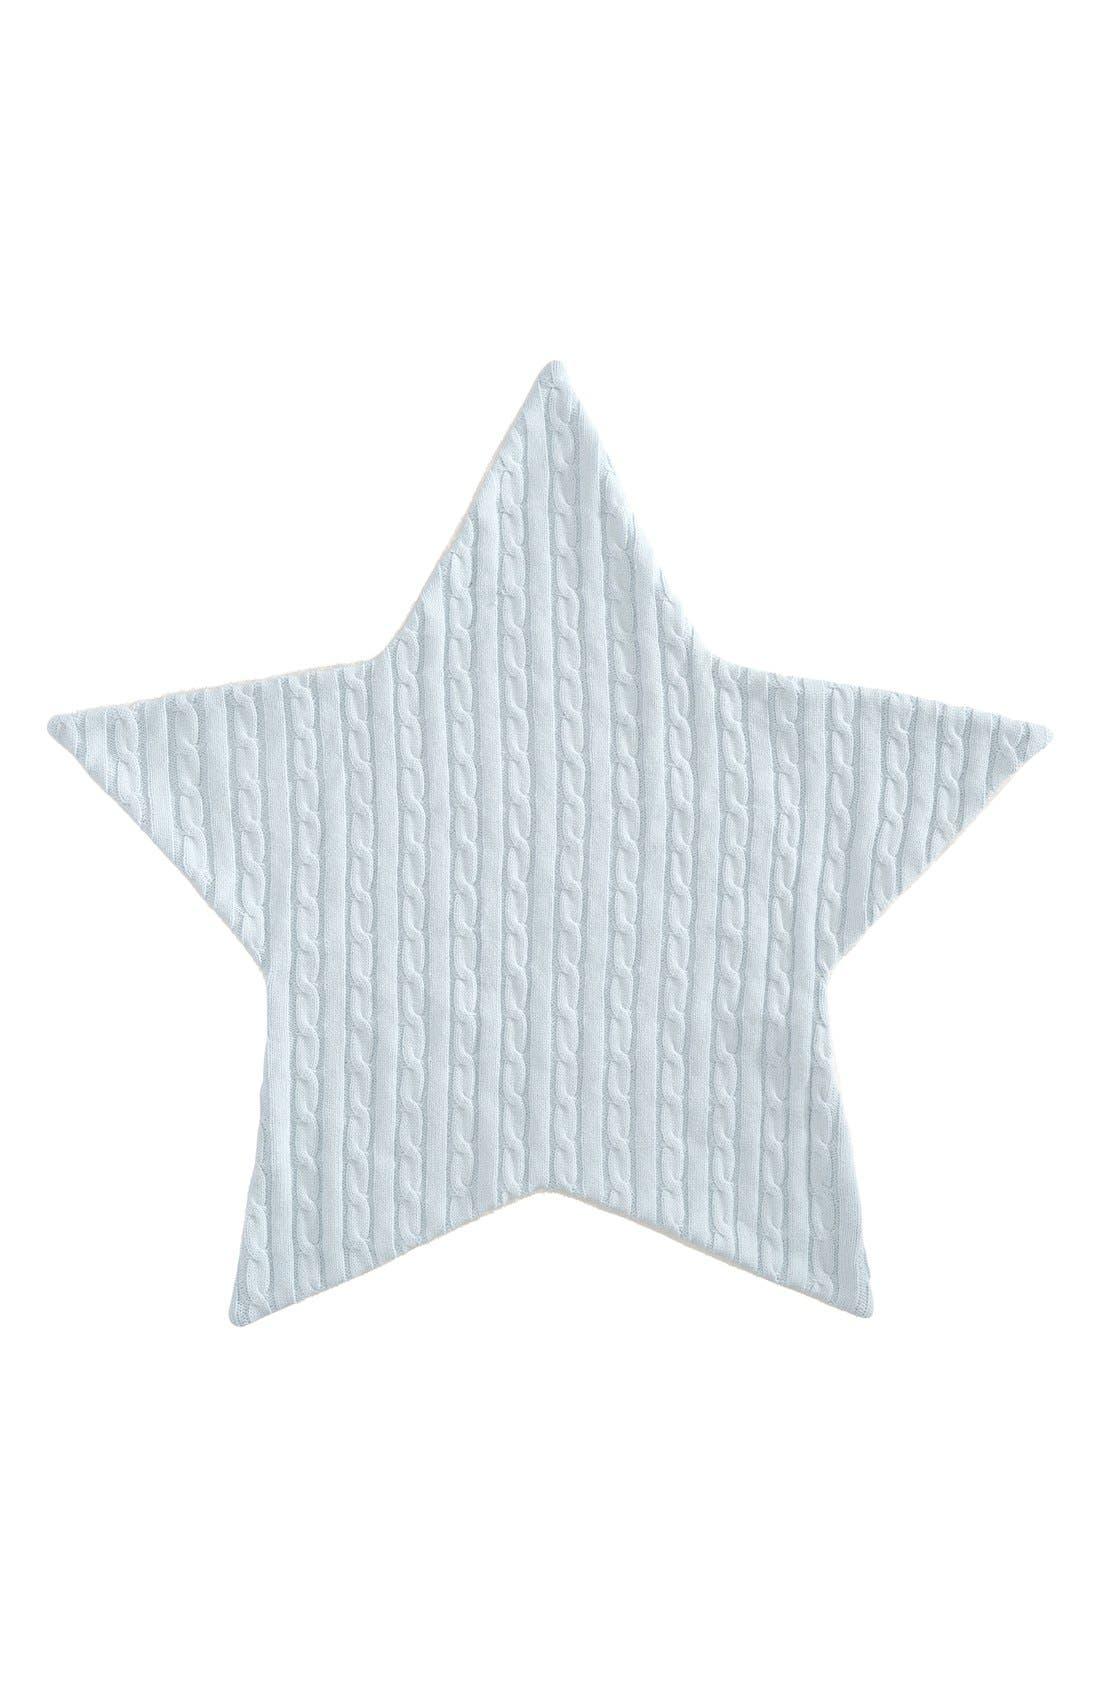 Alternate Image 1 Selected - Elegant Baby Cable Knit Star Blanket